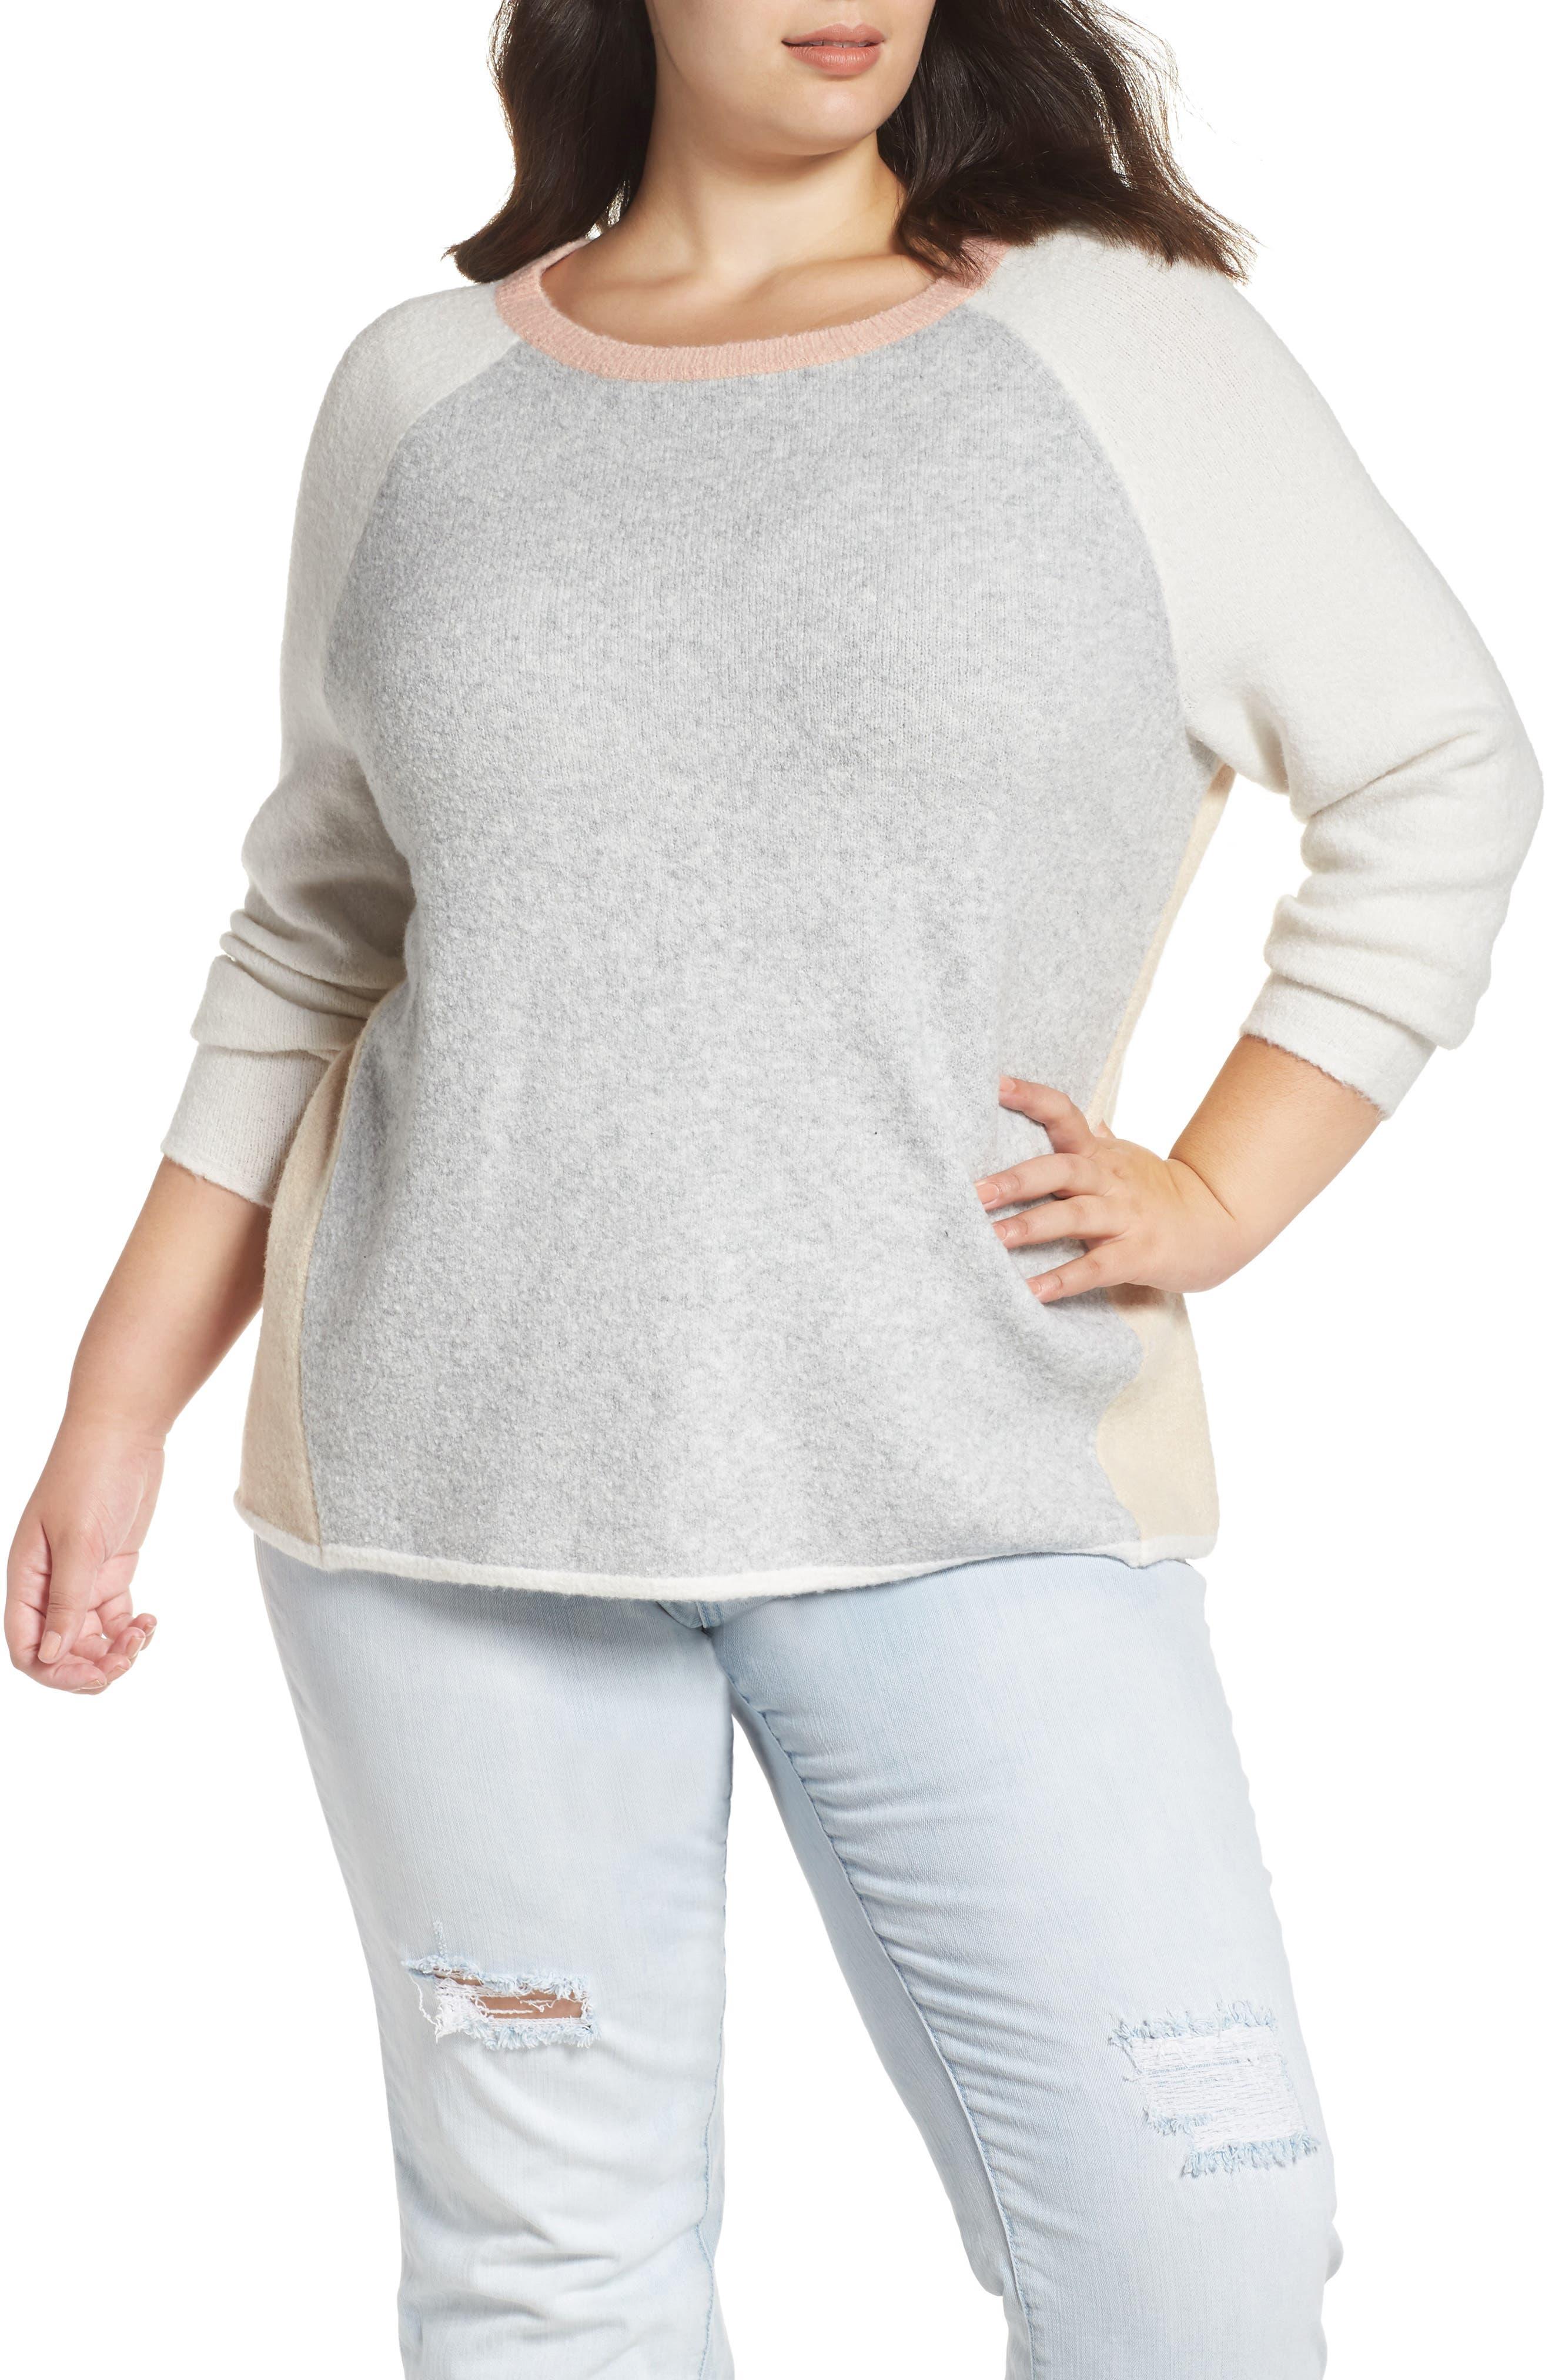 Colorblock Sweater,                         Main,                         color, GREY LT HEATHER CB